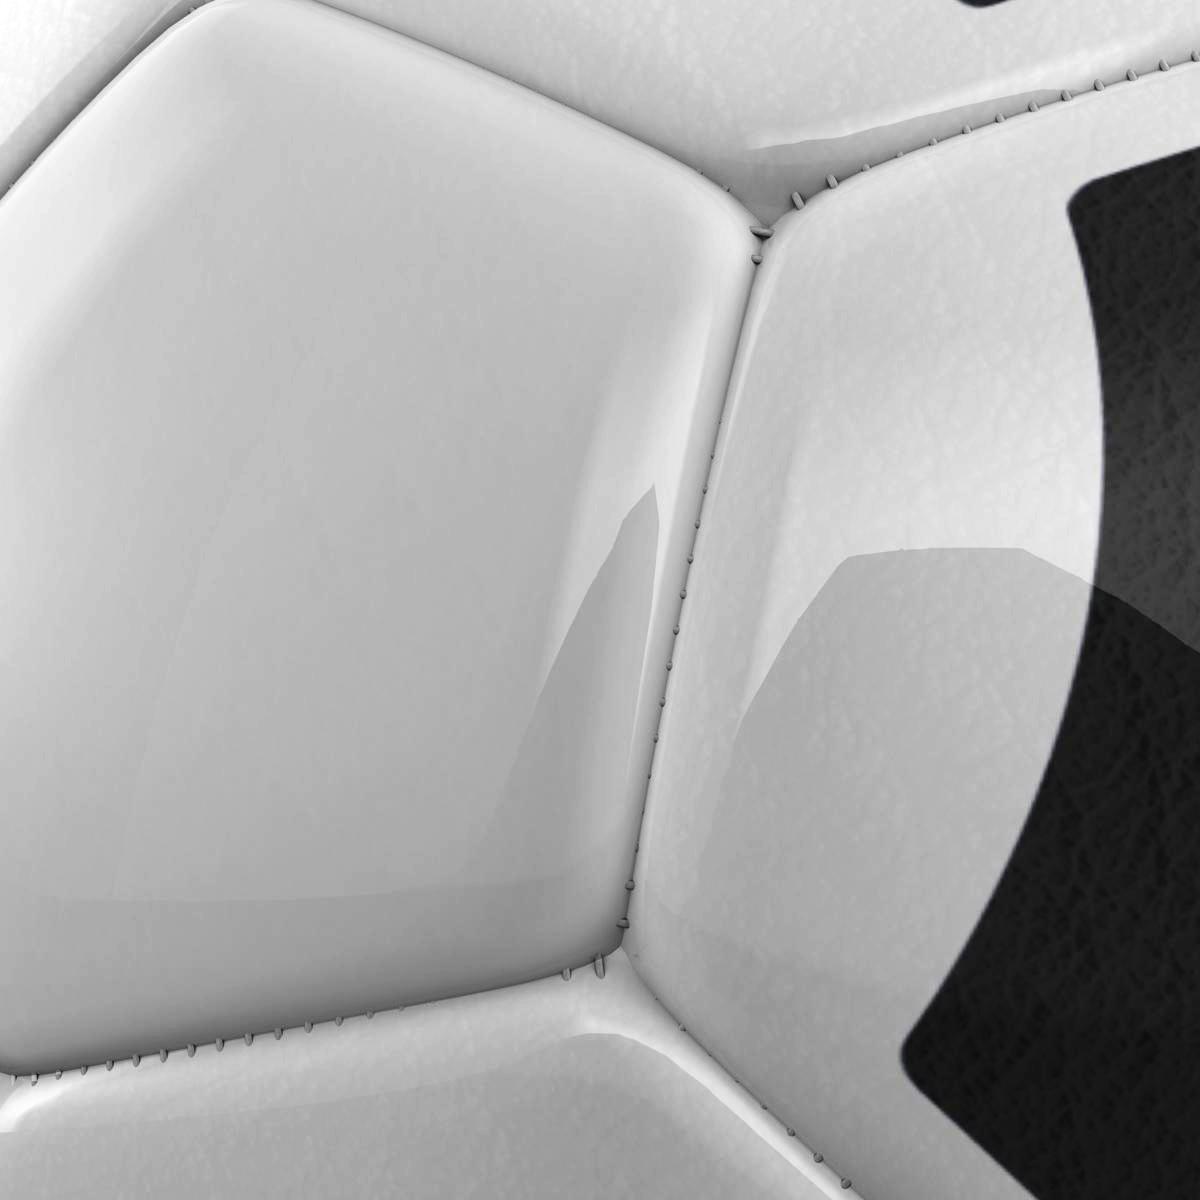 soccerball хар цагаан tri 3d загвар 3ds max fbx c4d ma mb obj 204052